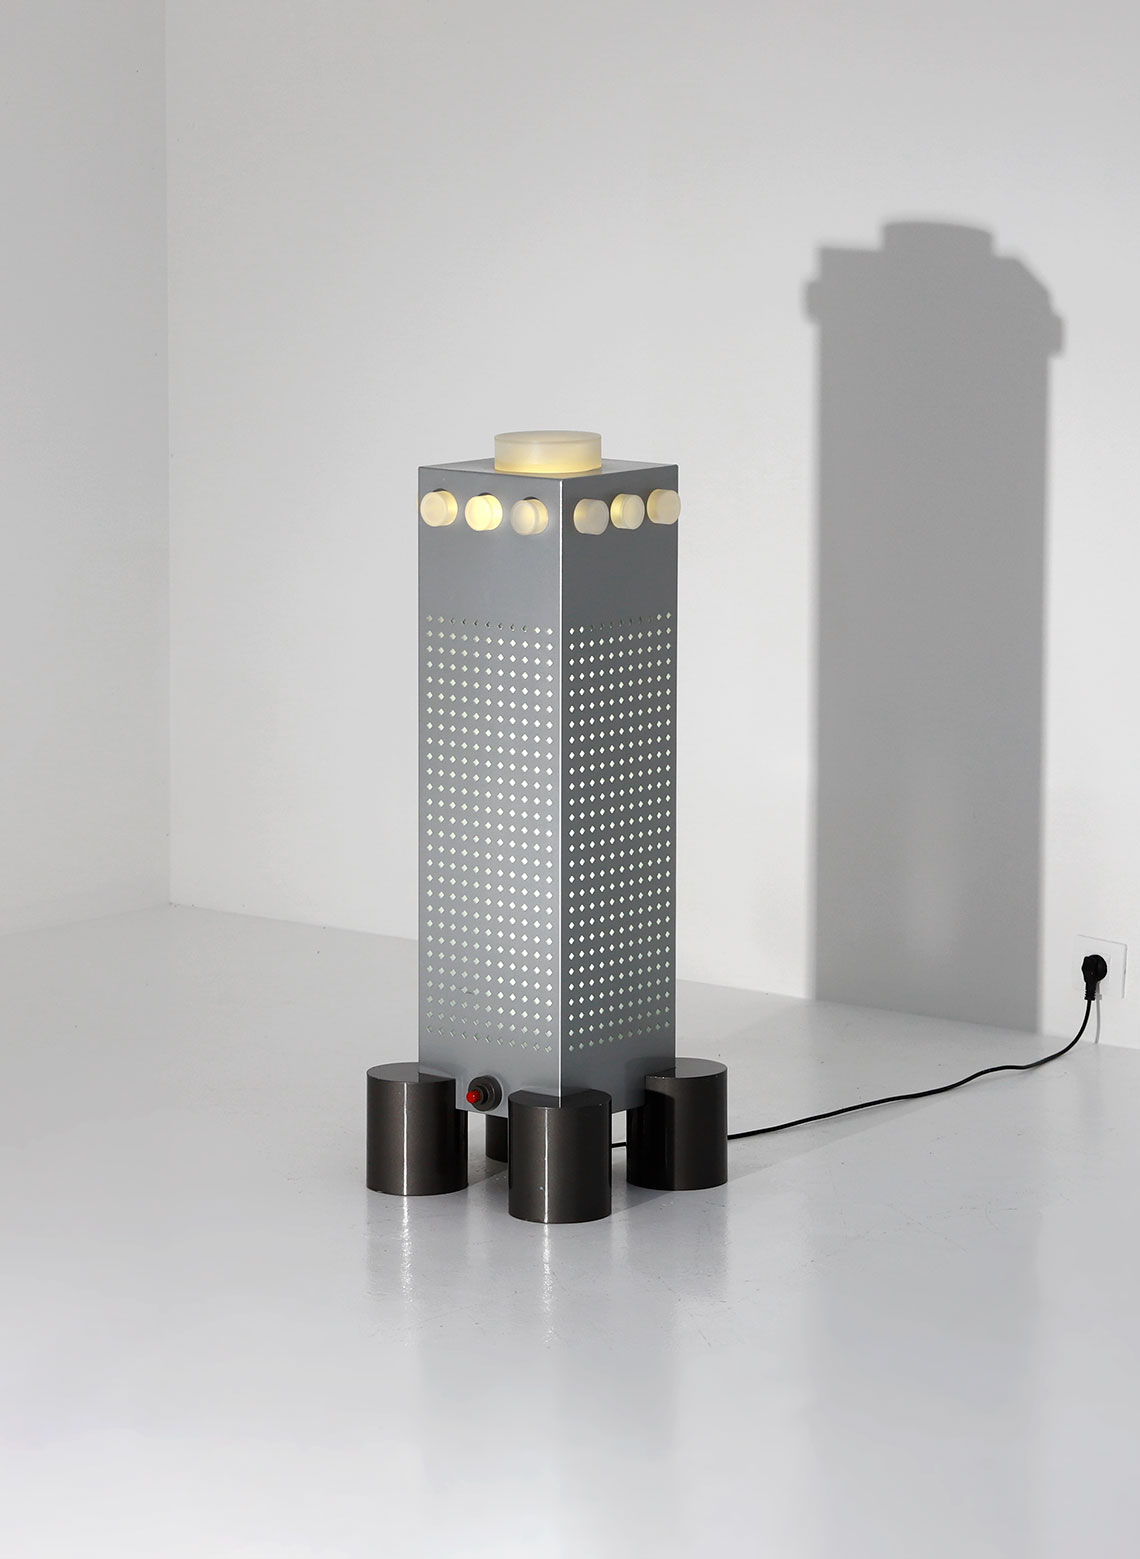 Matteo Thun & Andrea Lera wwf Tower Bieffeplast image 1